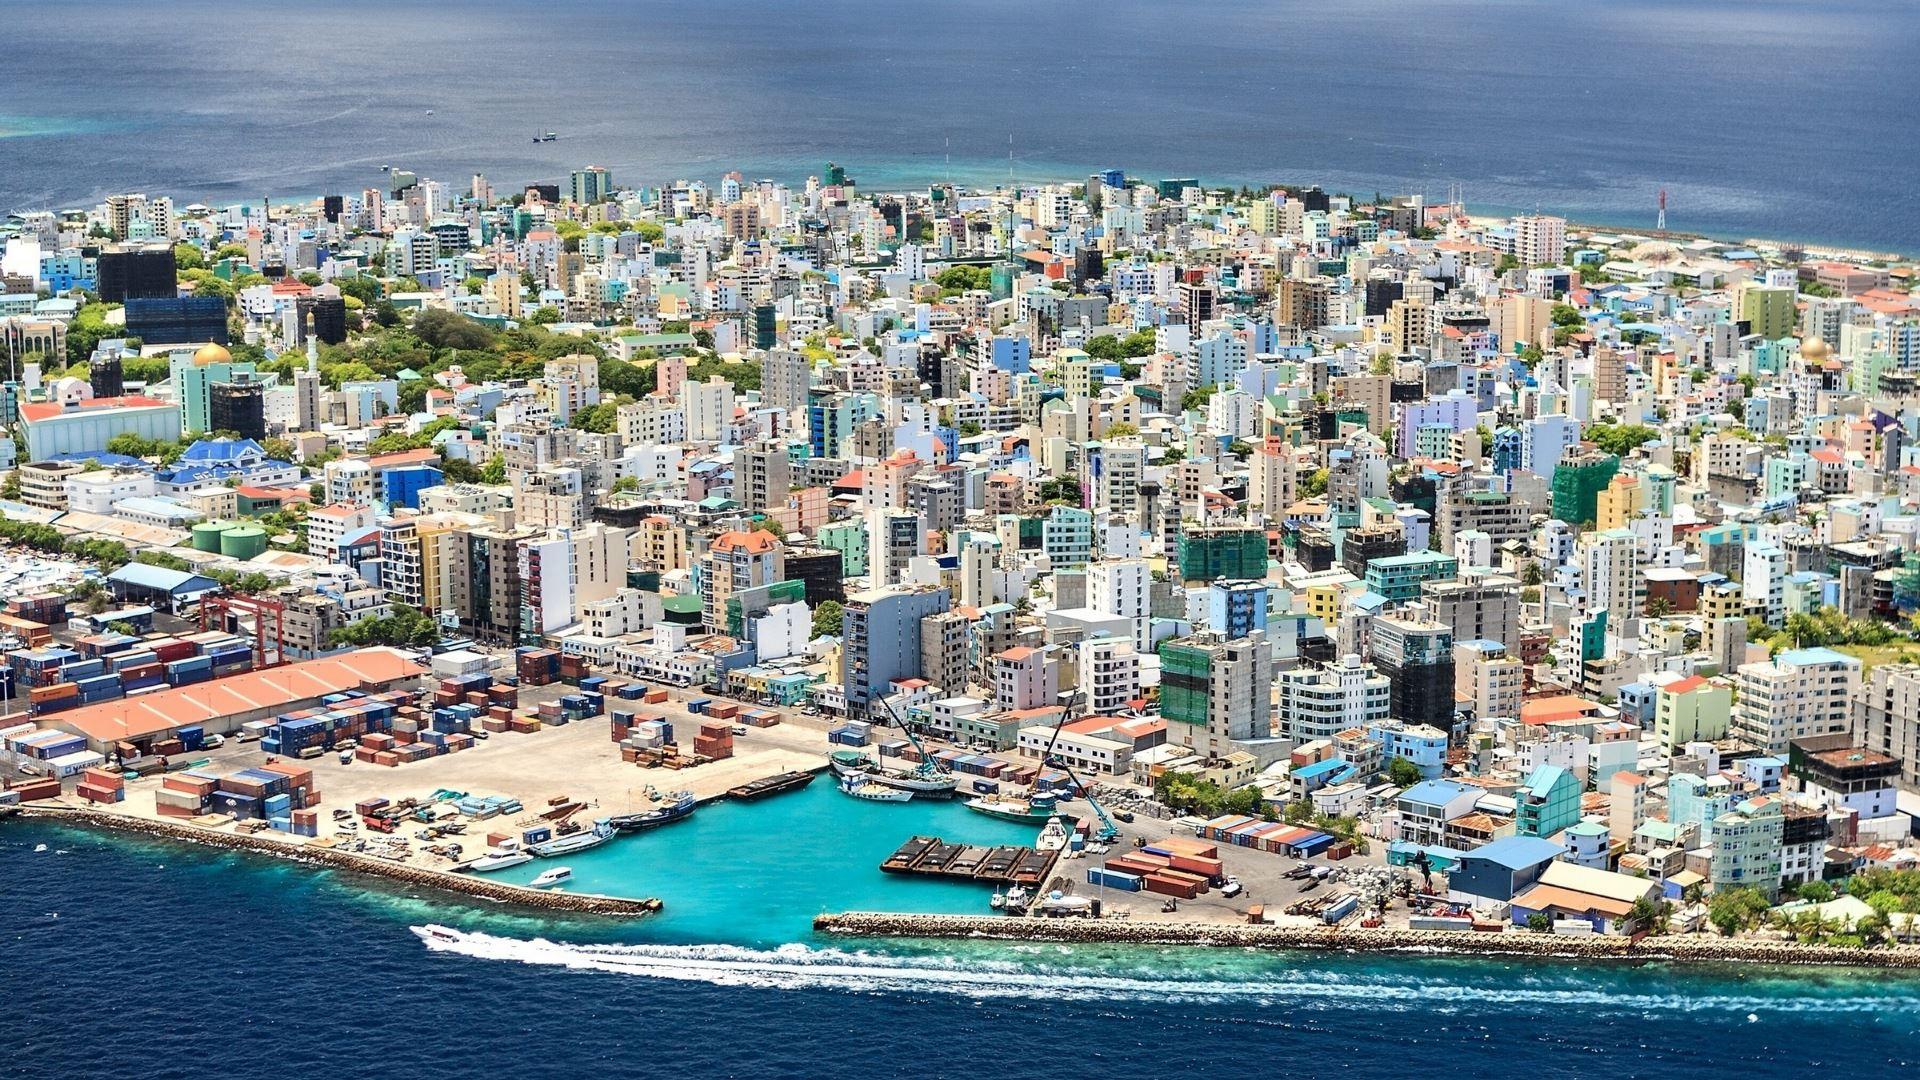 http://www.prasannaholidays.com/wp-content/uploads/2014/11/Male_Island_Maldives-1920x1080.jpg